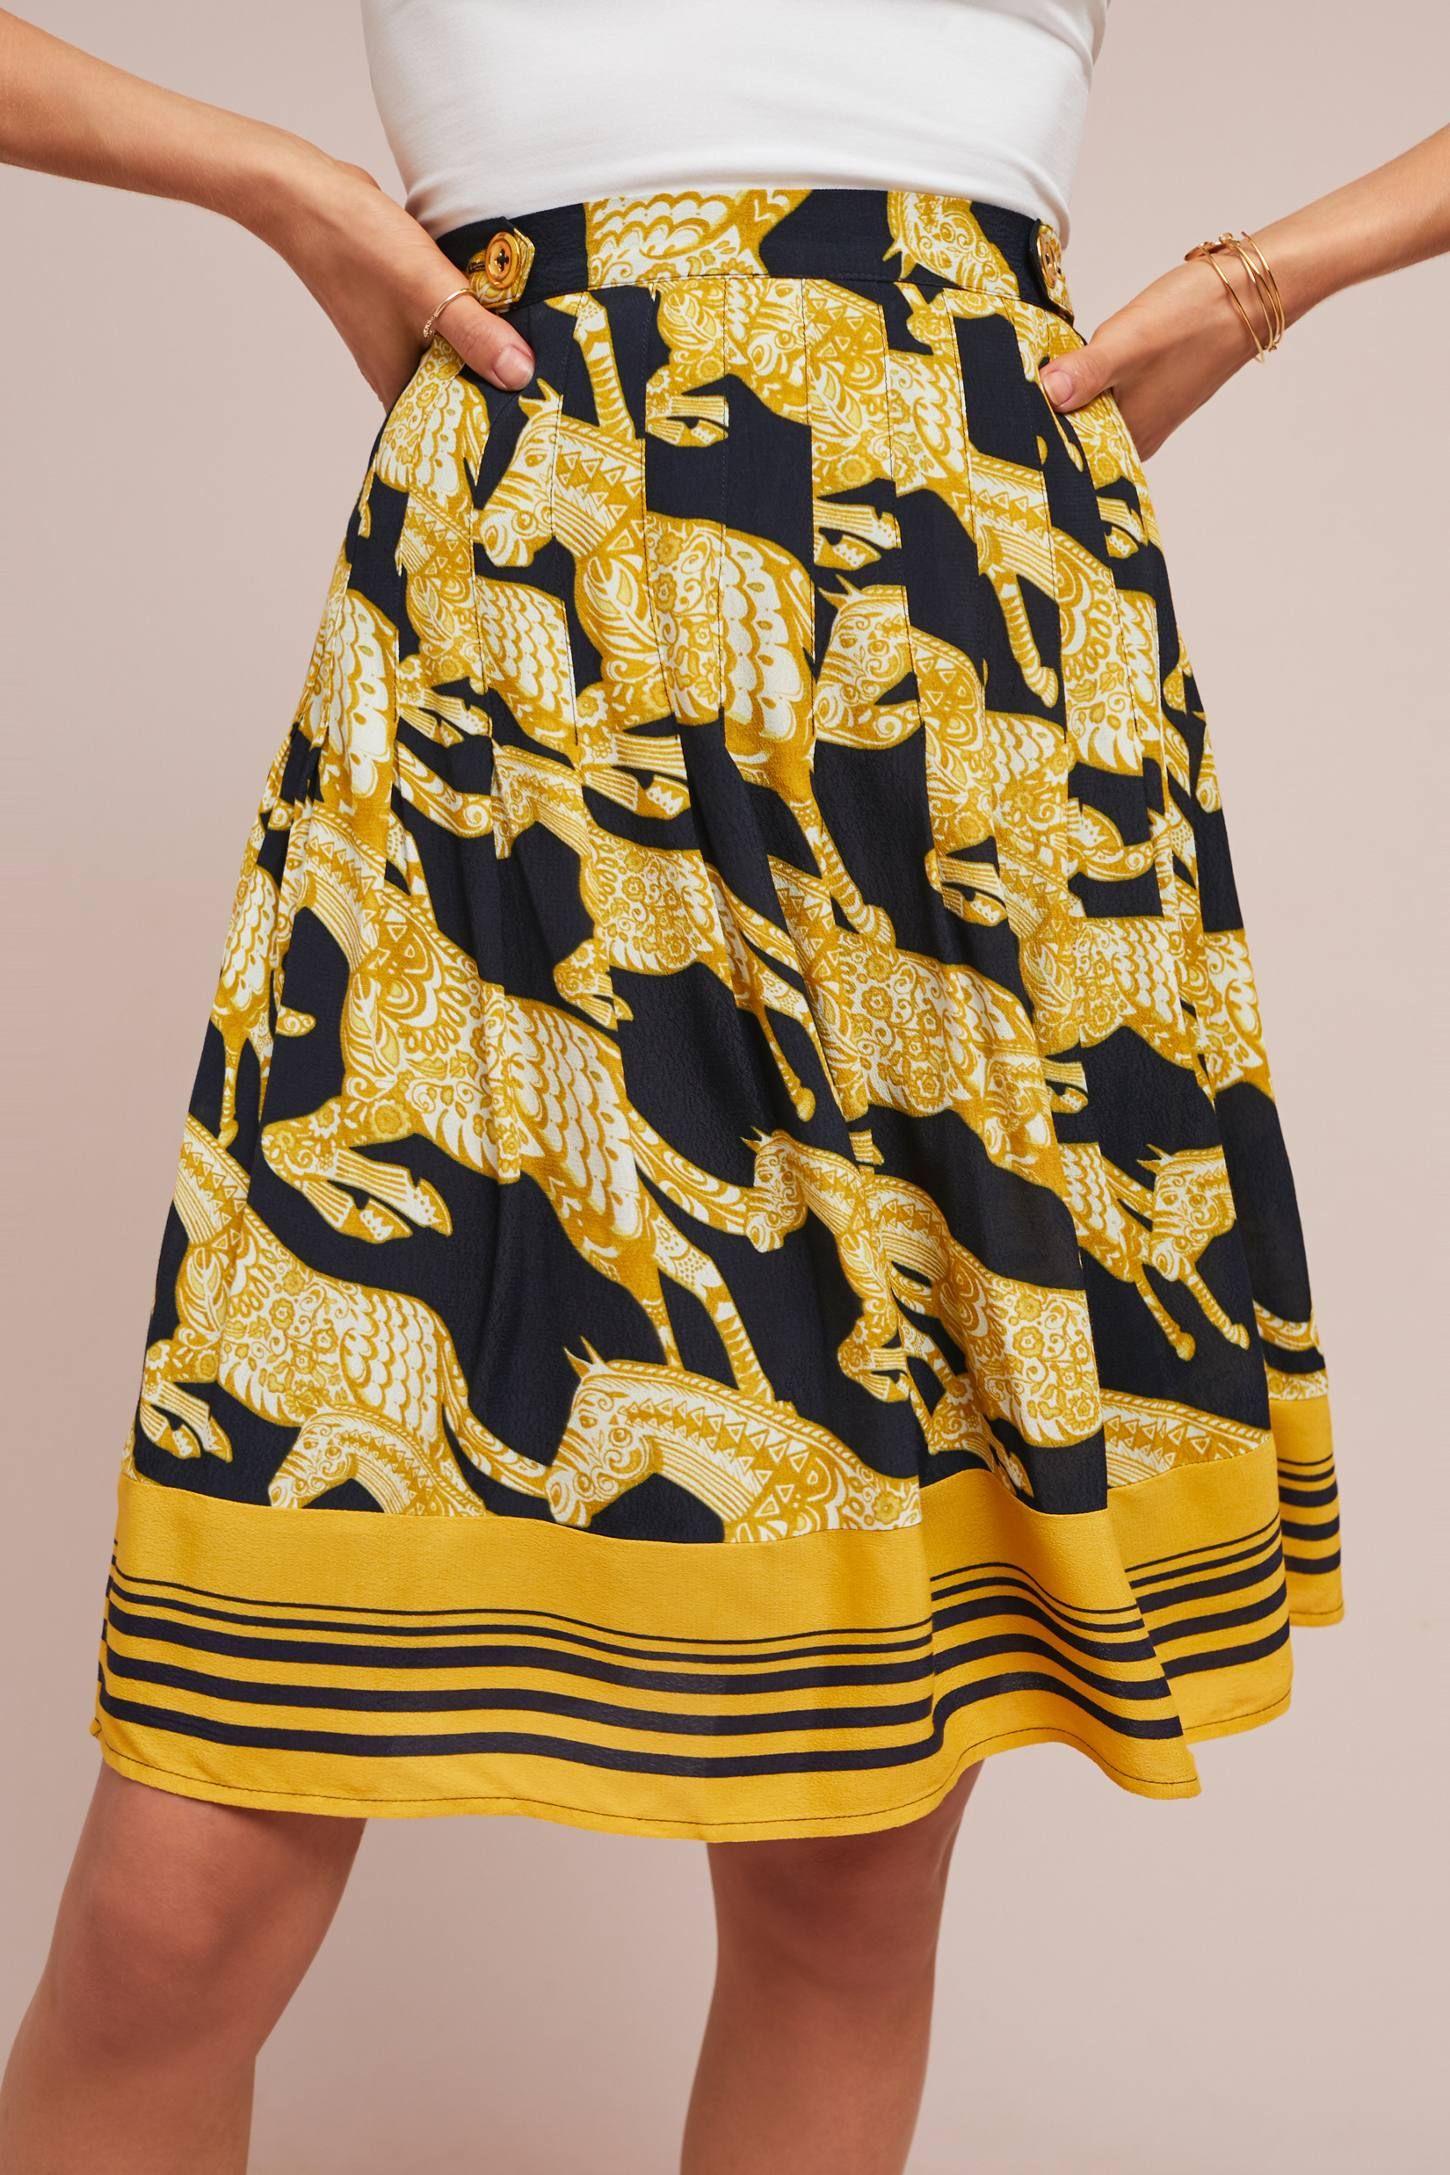 2aab989c0b Jade A-Line Skirt   AW WHAT?!...I really like that.   A line skirts ...